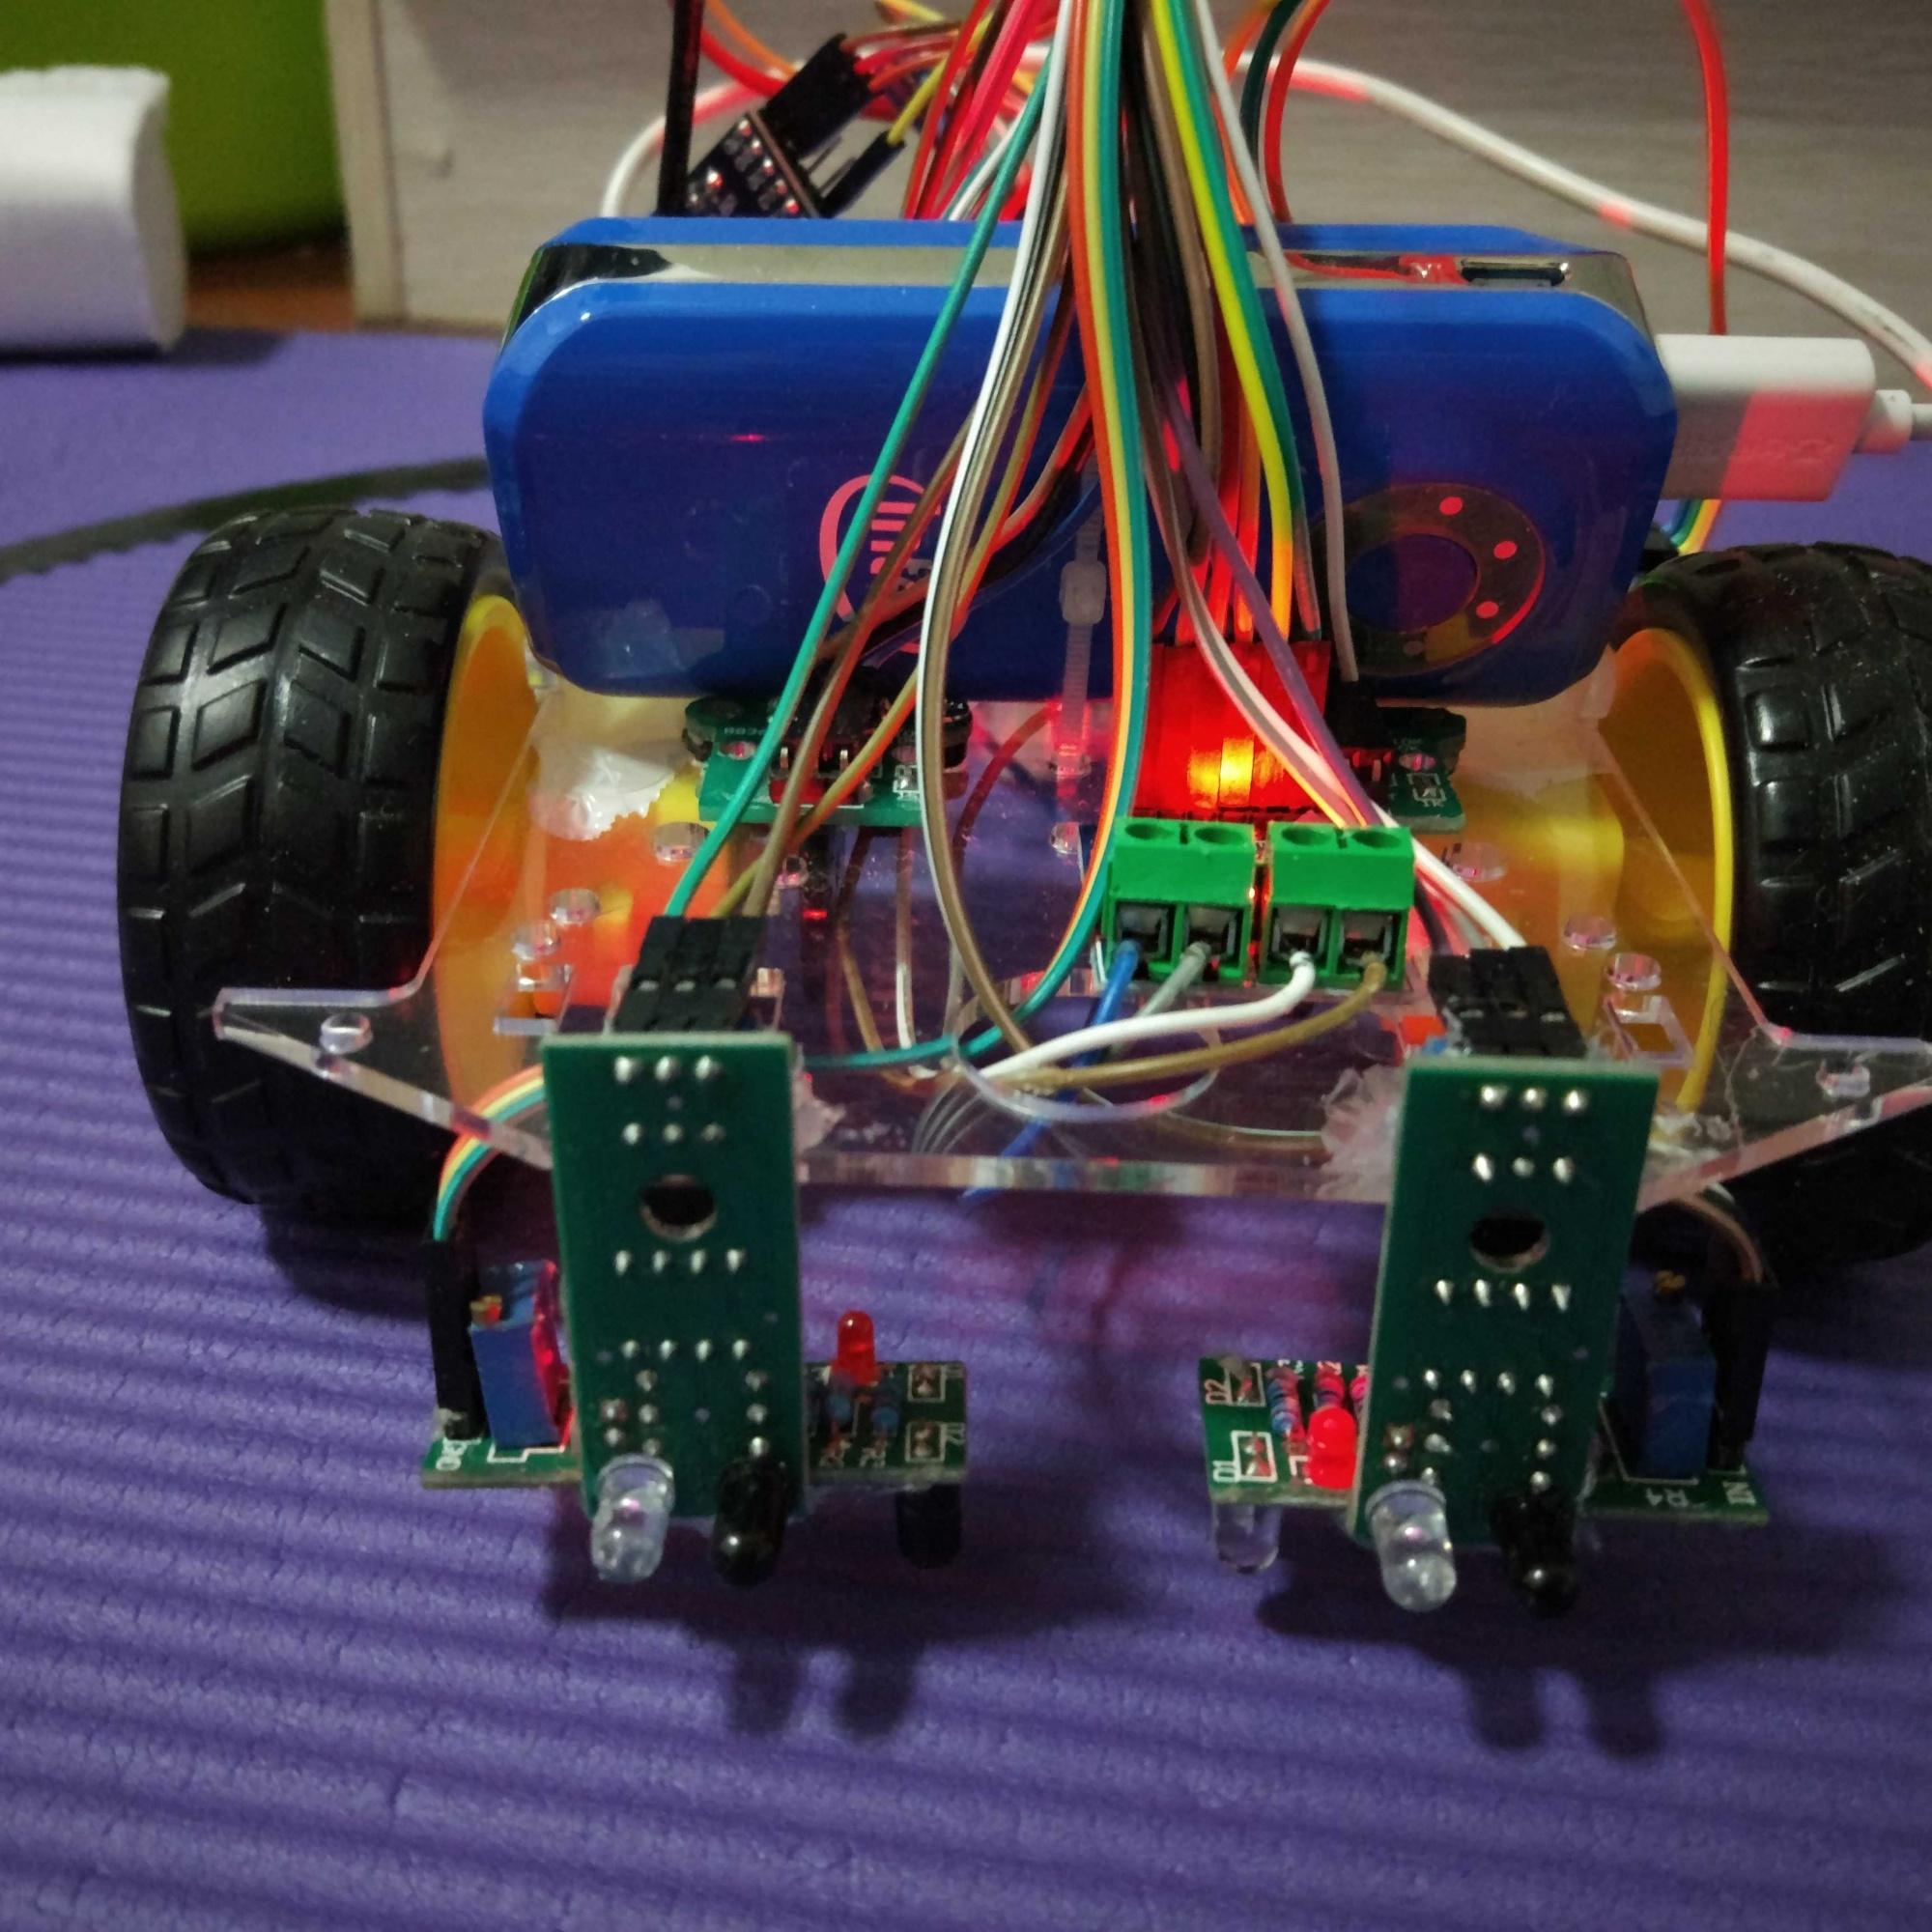 【orangepi zero试用体验】基于orangepi zero的智能小车 -- 结项